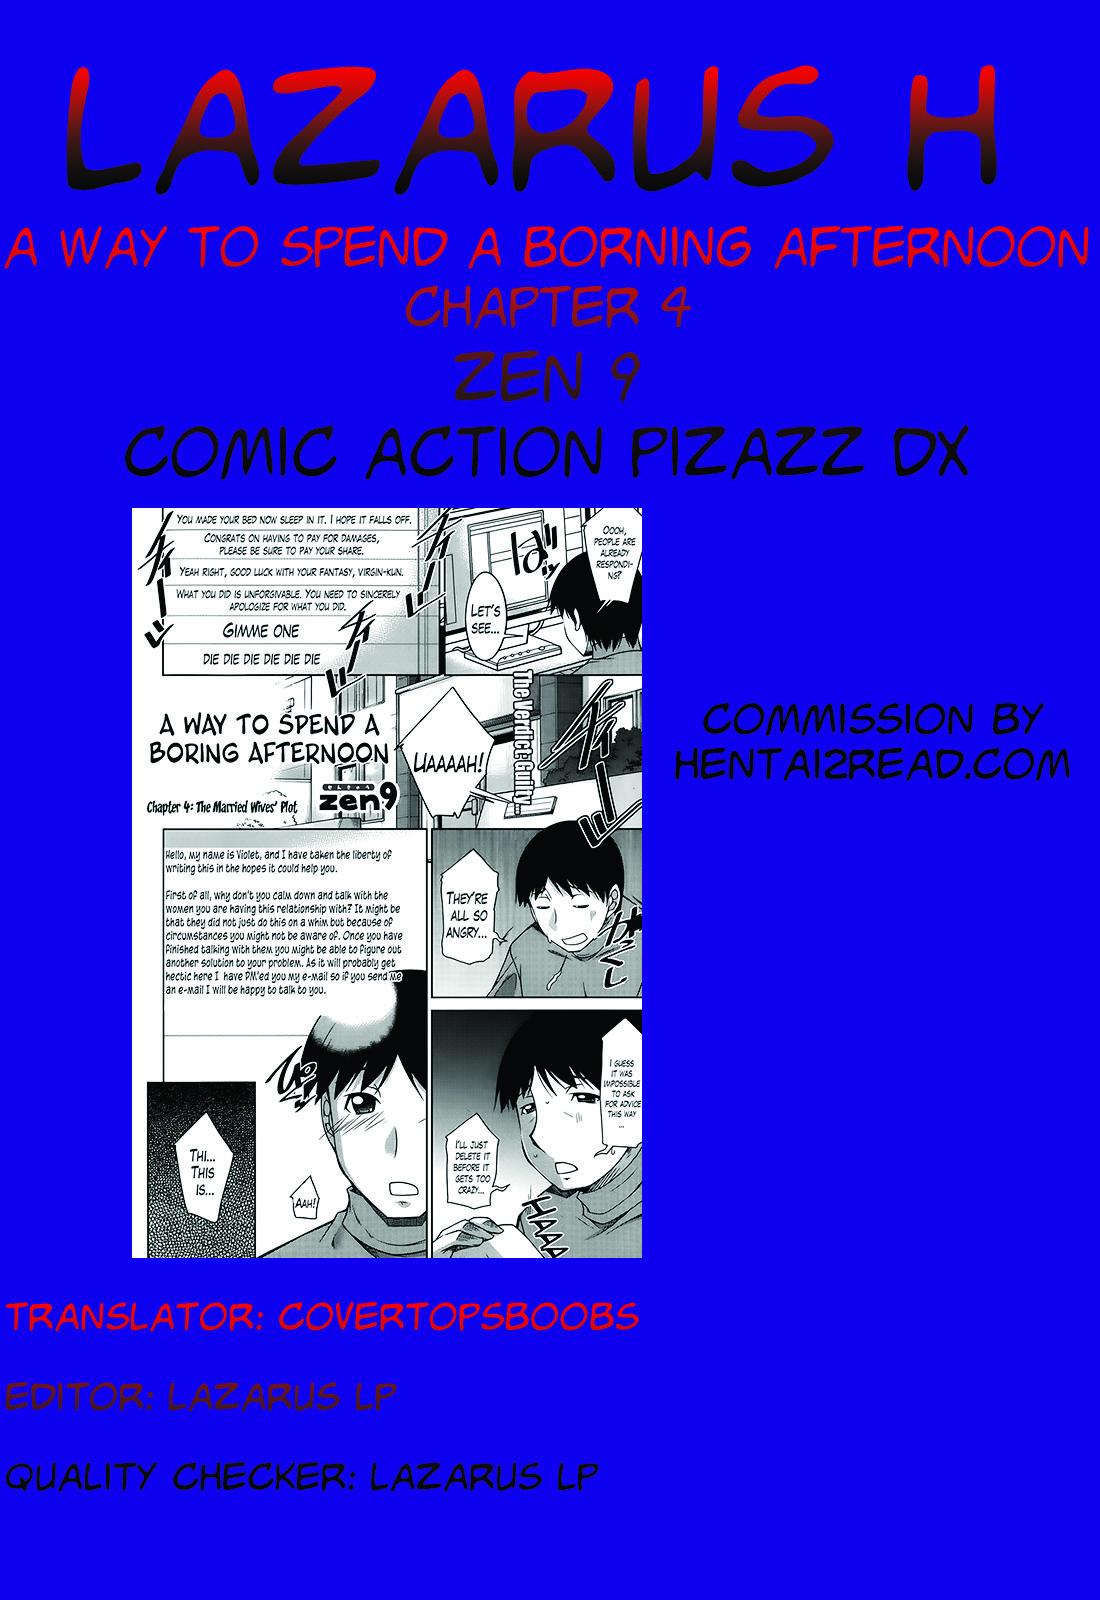 [Zen9] Taikutsu na Gogo no Sugoshikata Ch. 1-4   A Way to Spend a Boring Afternoon Ch. 1-4 (Action Pizazz DX 2013-12) [English](hentai2read.com)[Lazarus H] 76